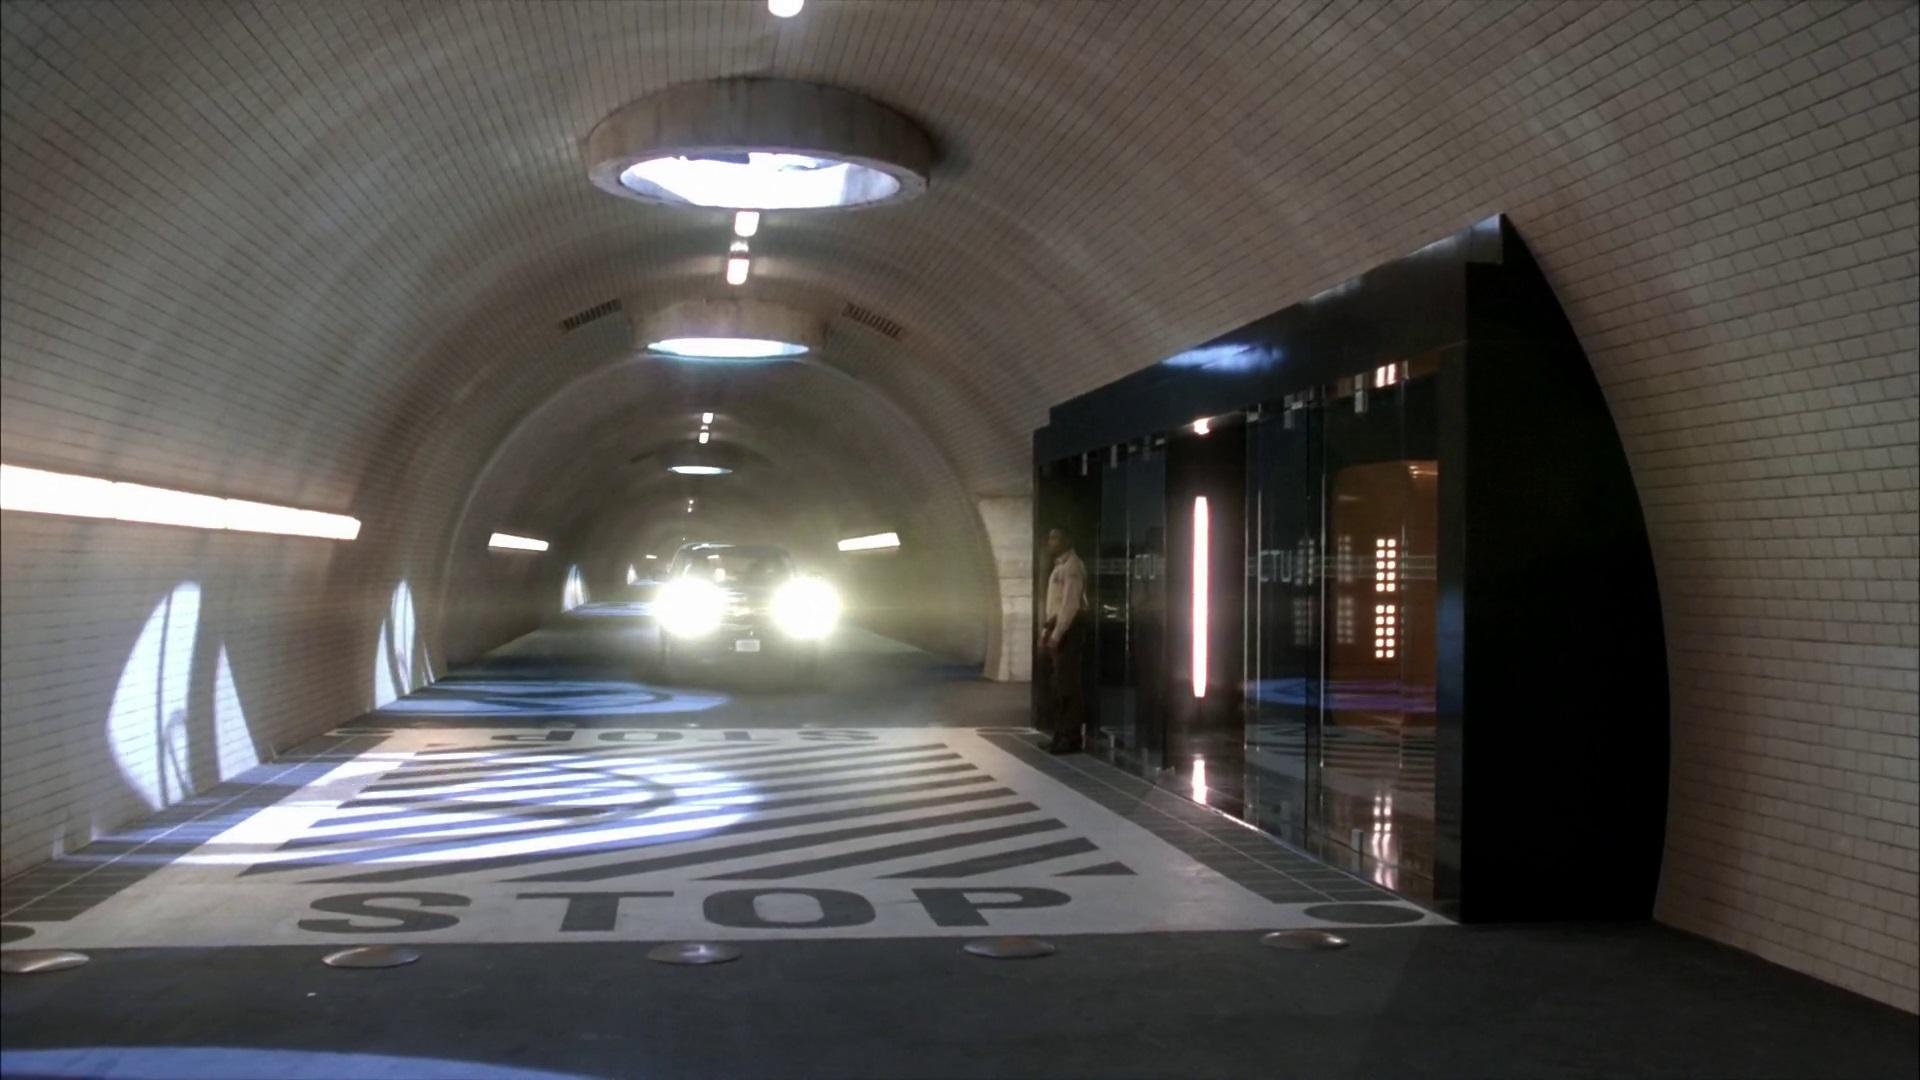 File:Ctuny-underground.jpg